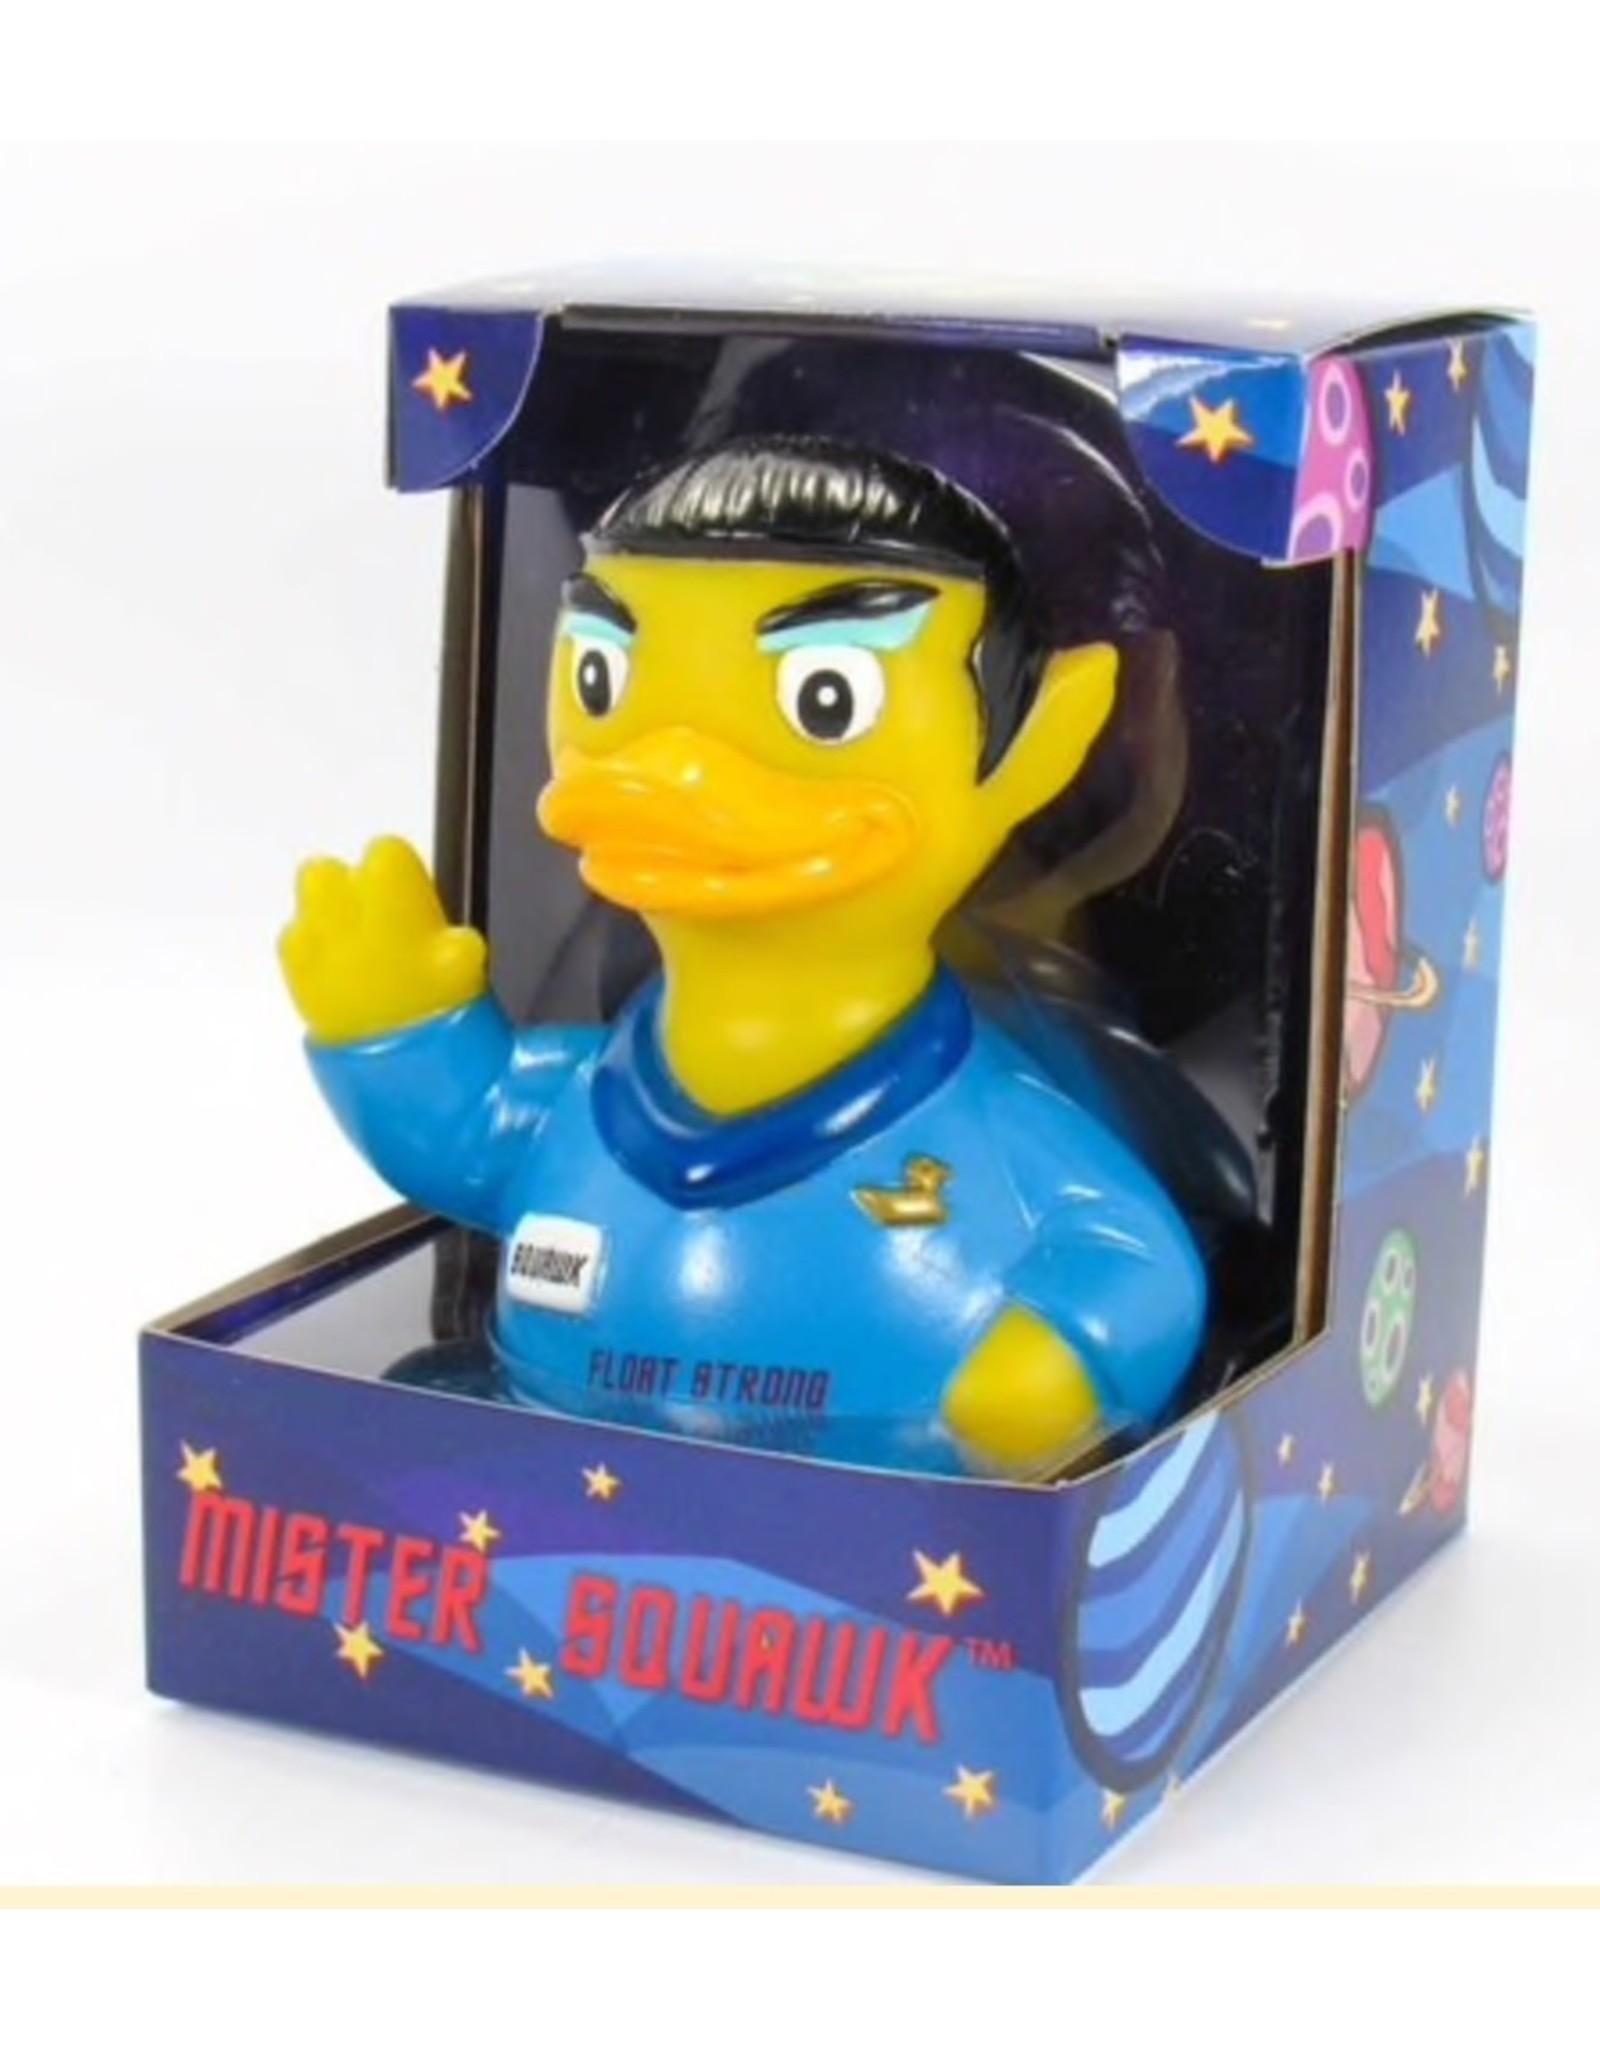 Mister Squawk Rubber Duck